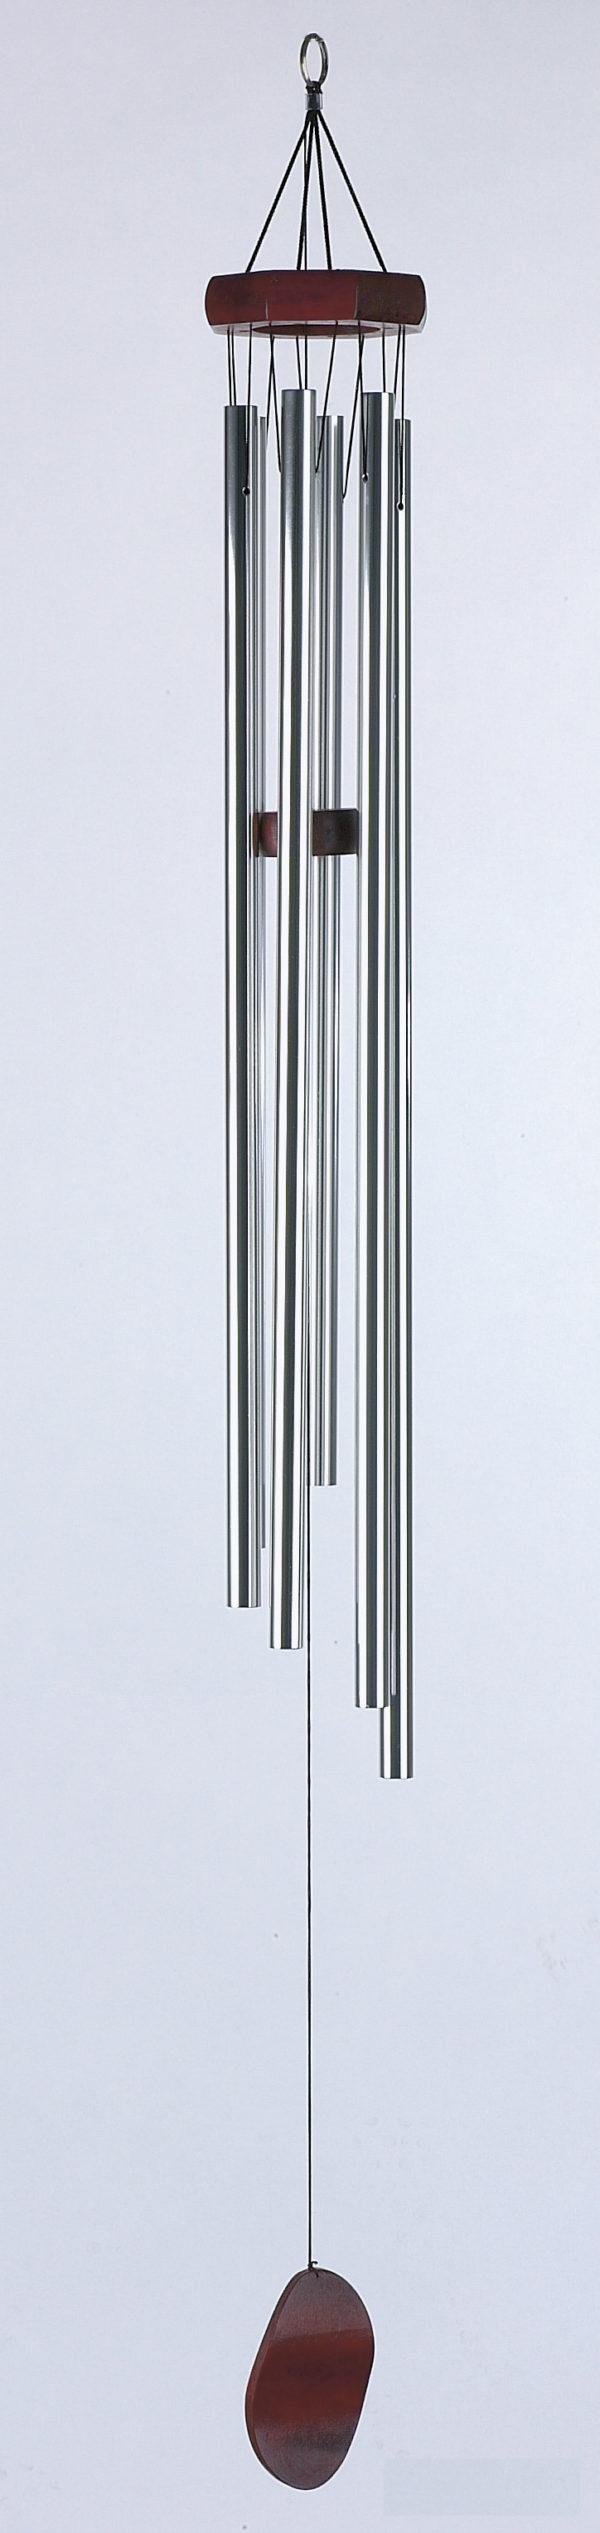 Wind Klangspiel mit 6 Klangröhren, silber/mahagoni, Länge 77cm